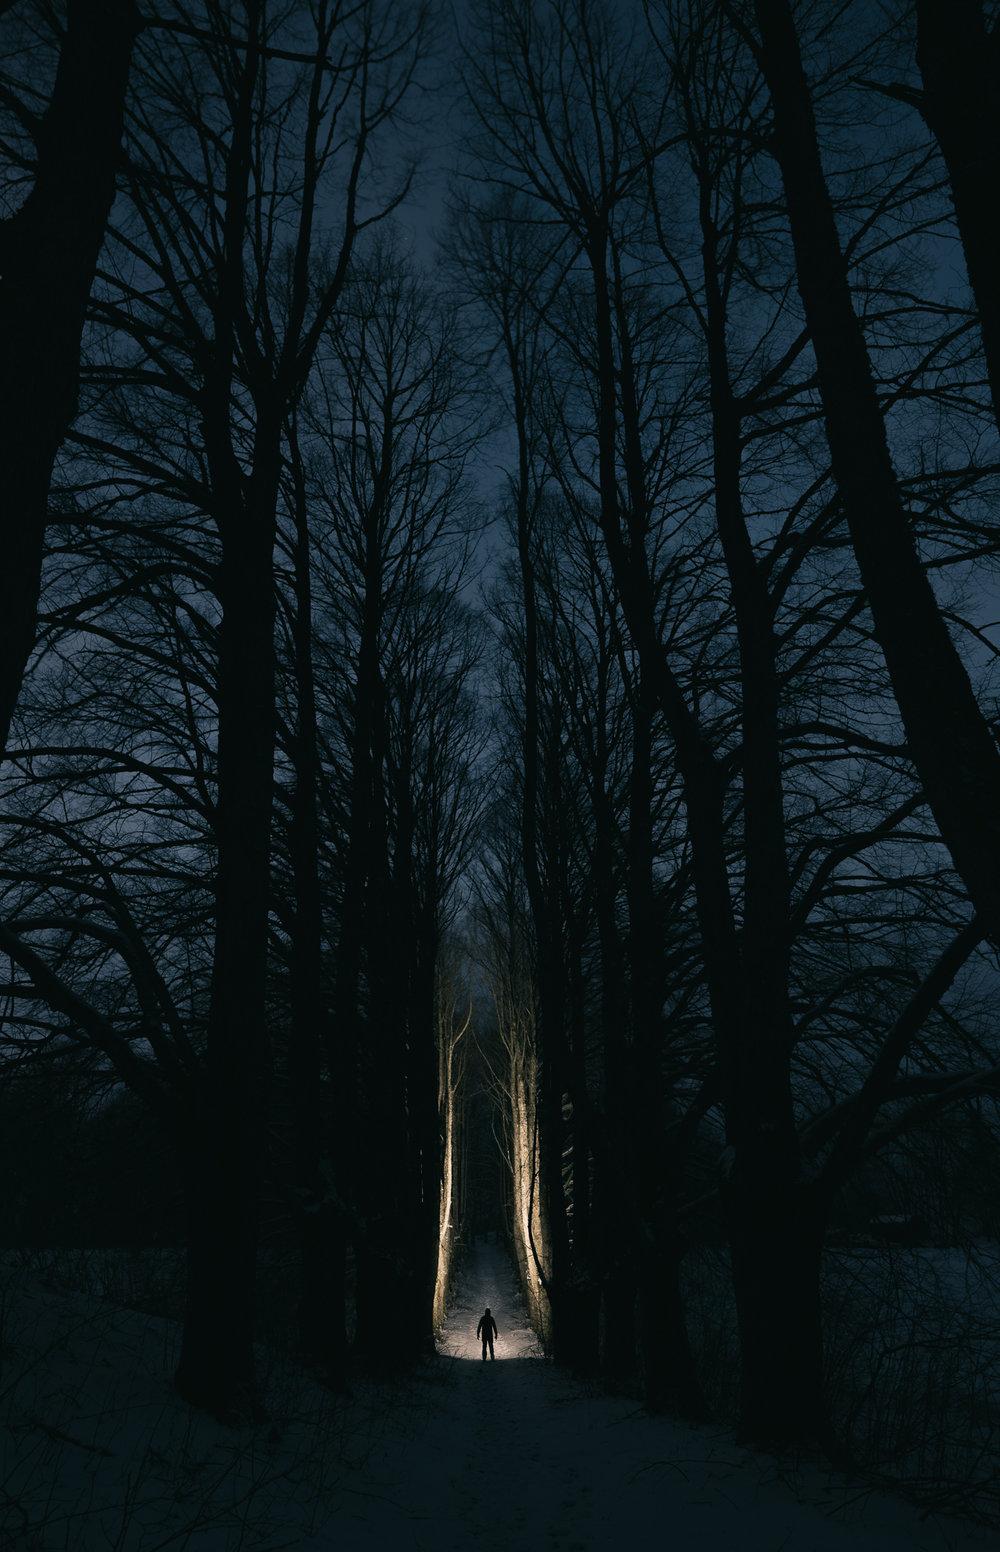 NIGHT - IN LATVIA